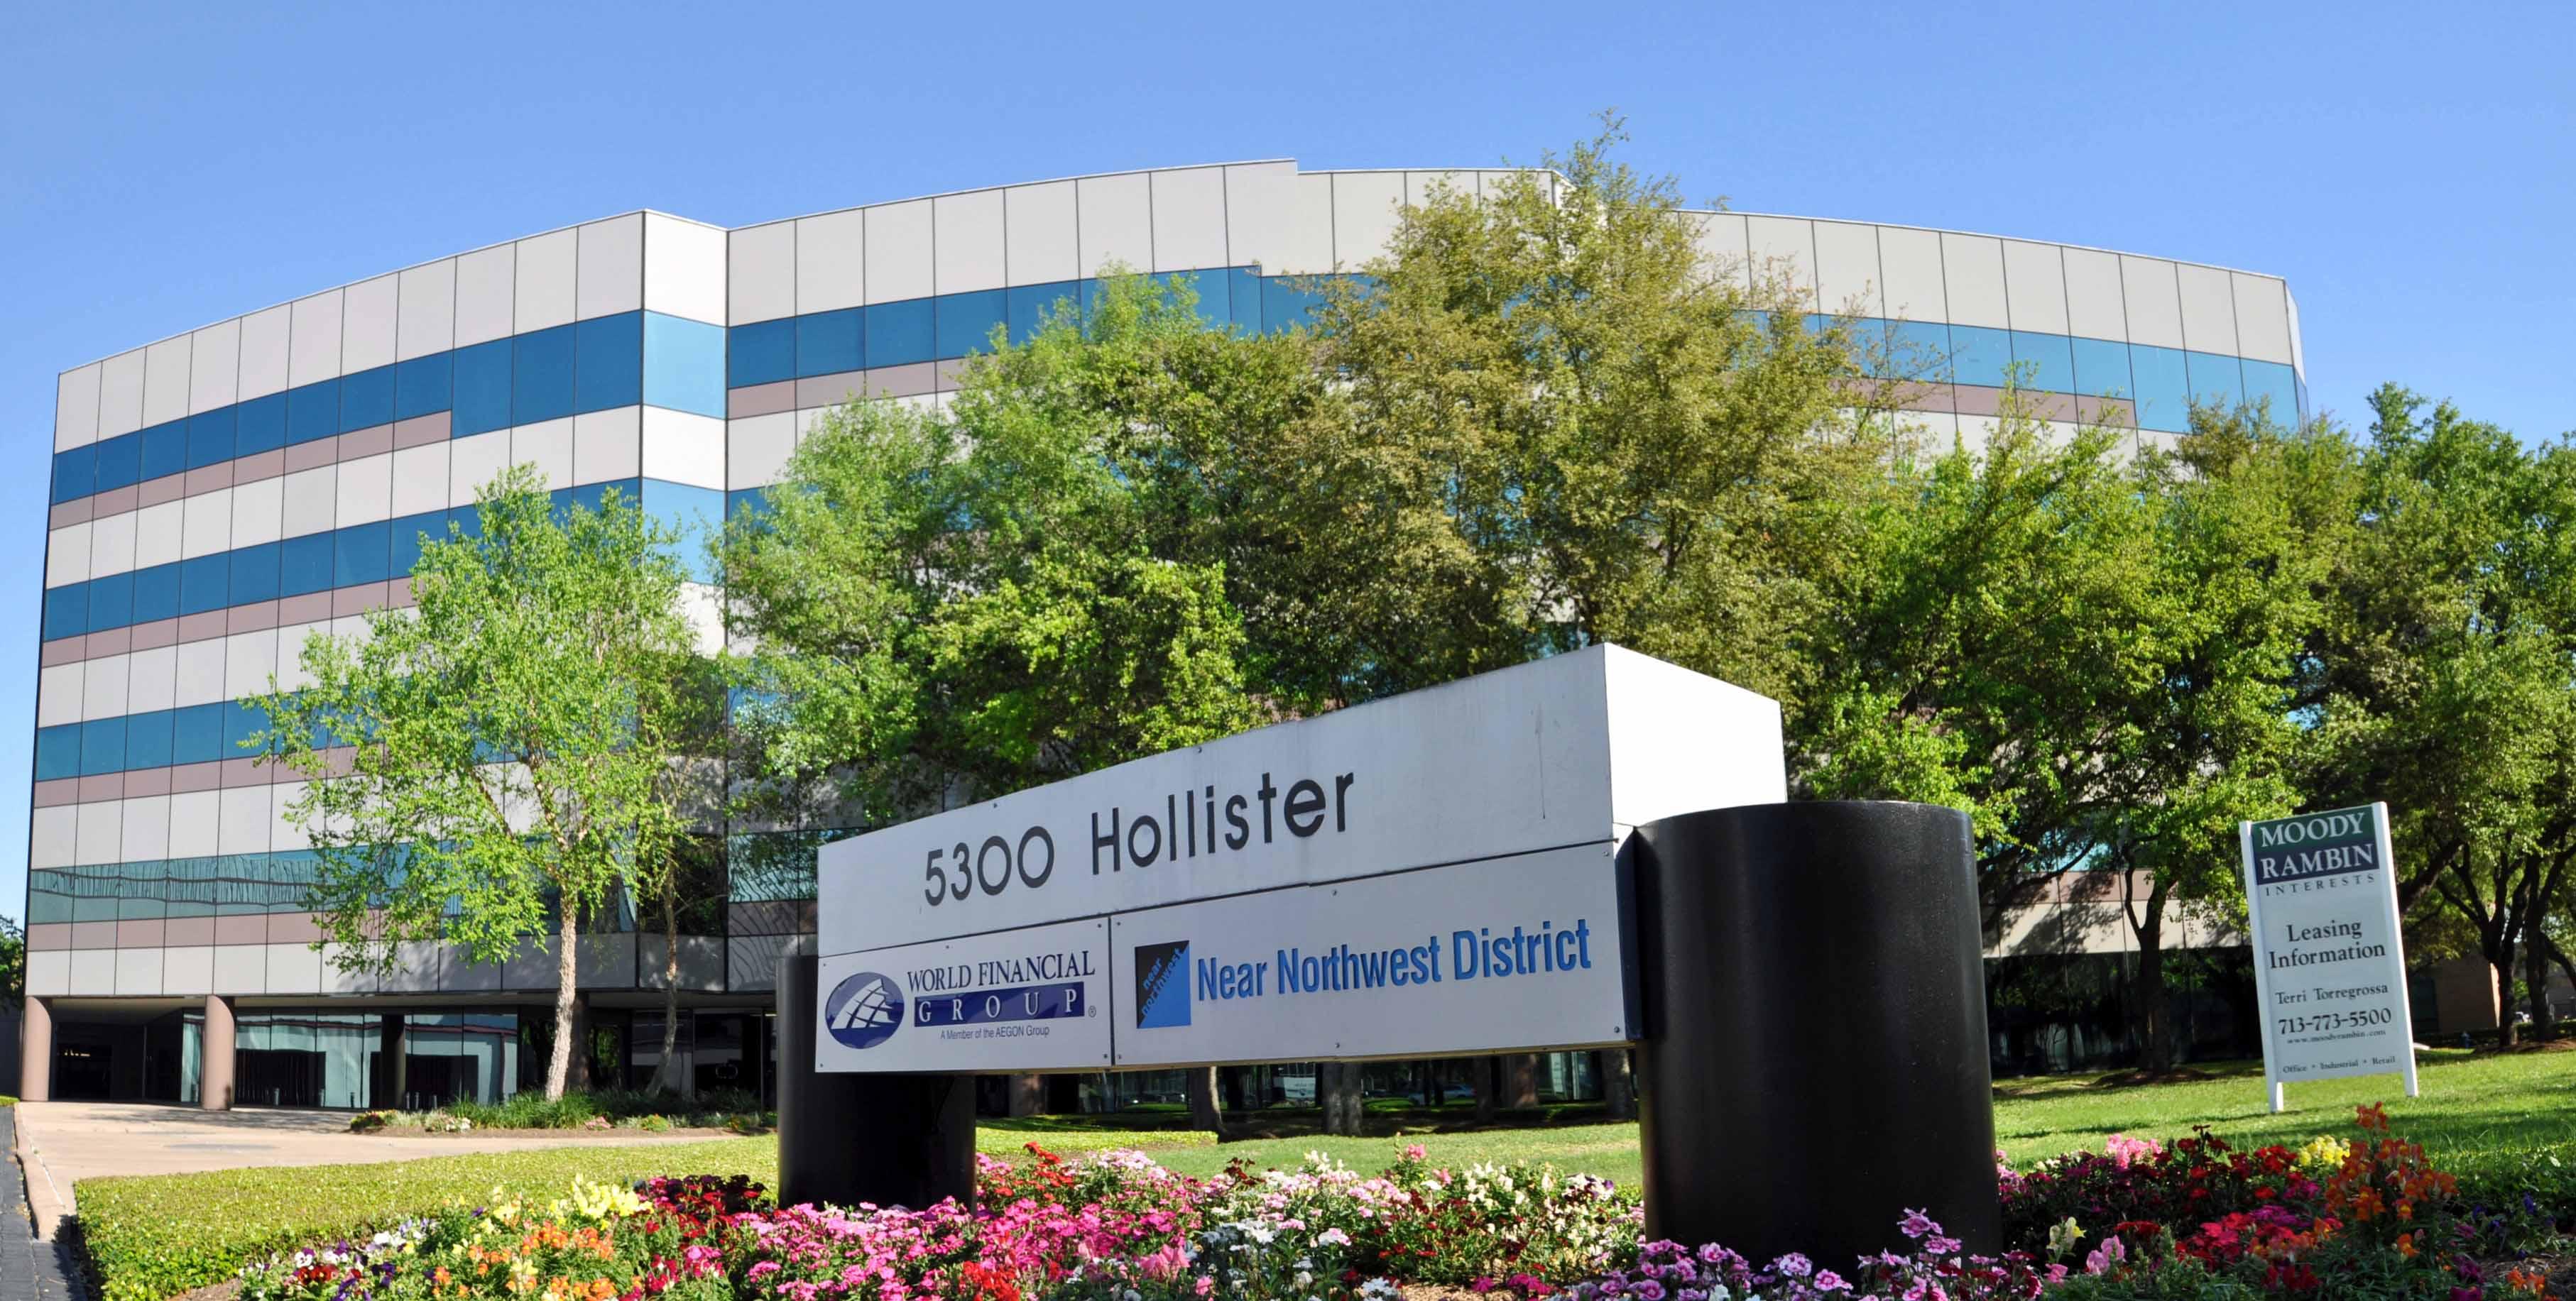 Hollister and Hillmont Bldg